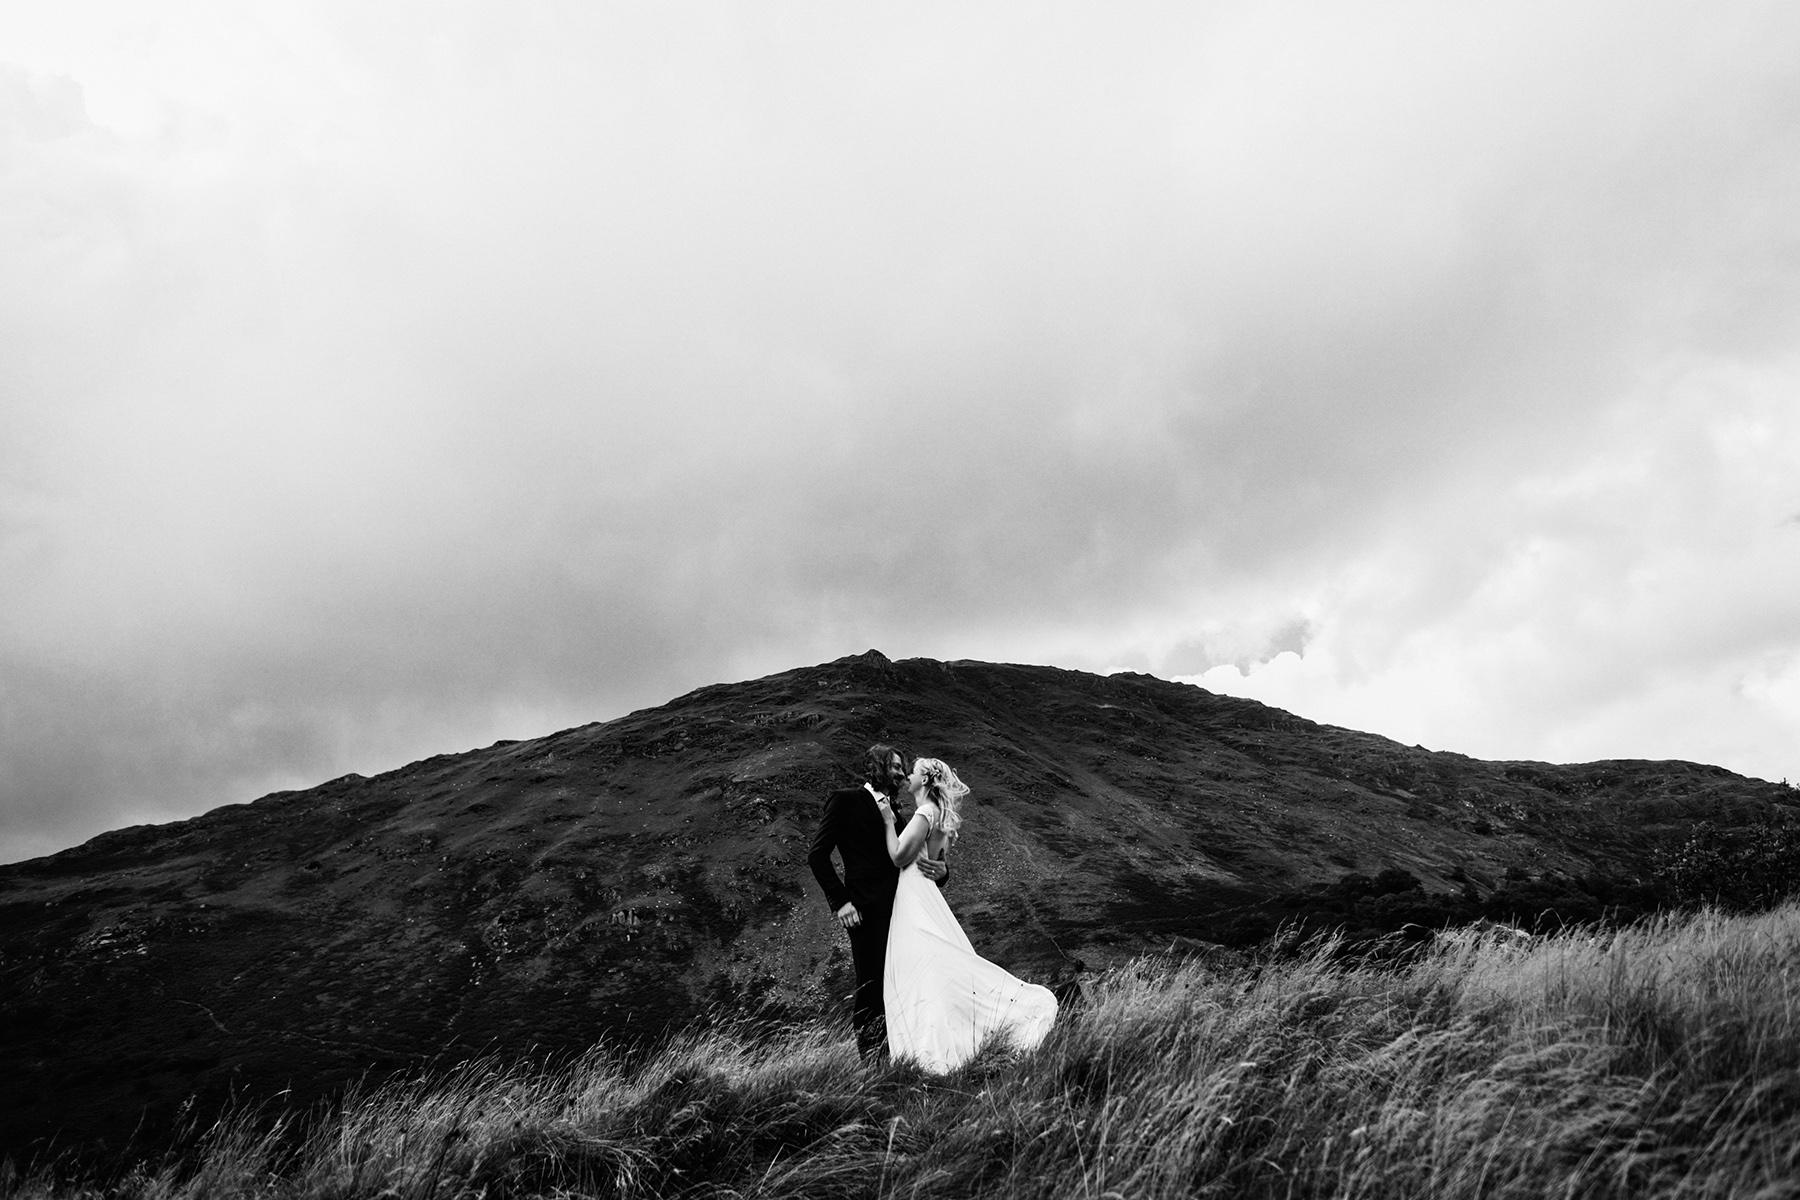 Snowdonia-Wales-Wedding-Photos-0353.jpg